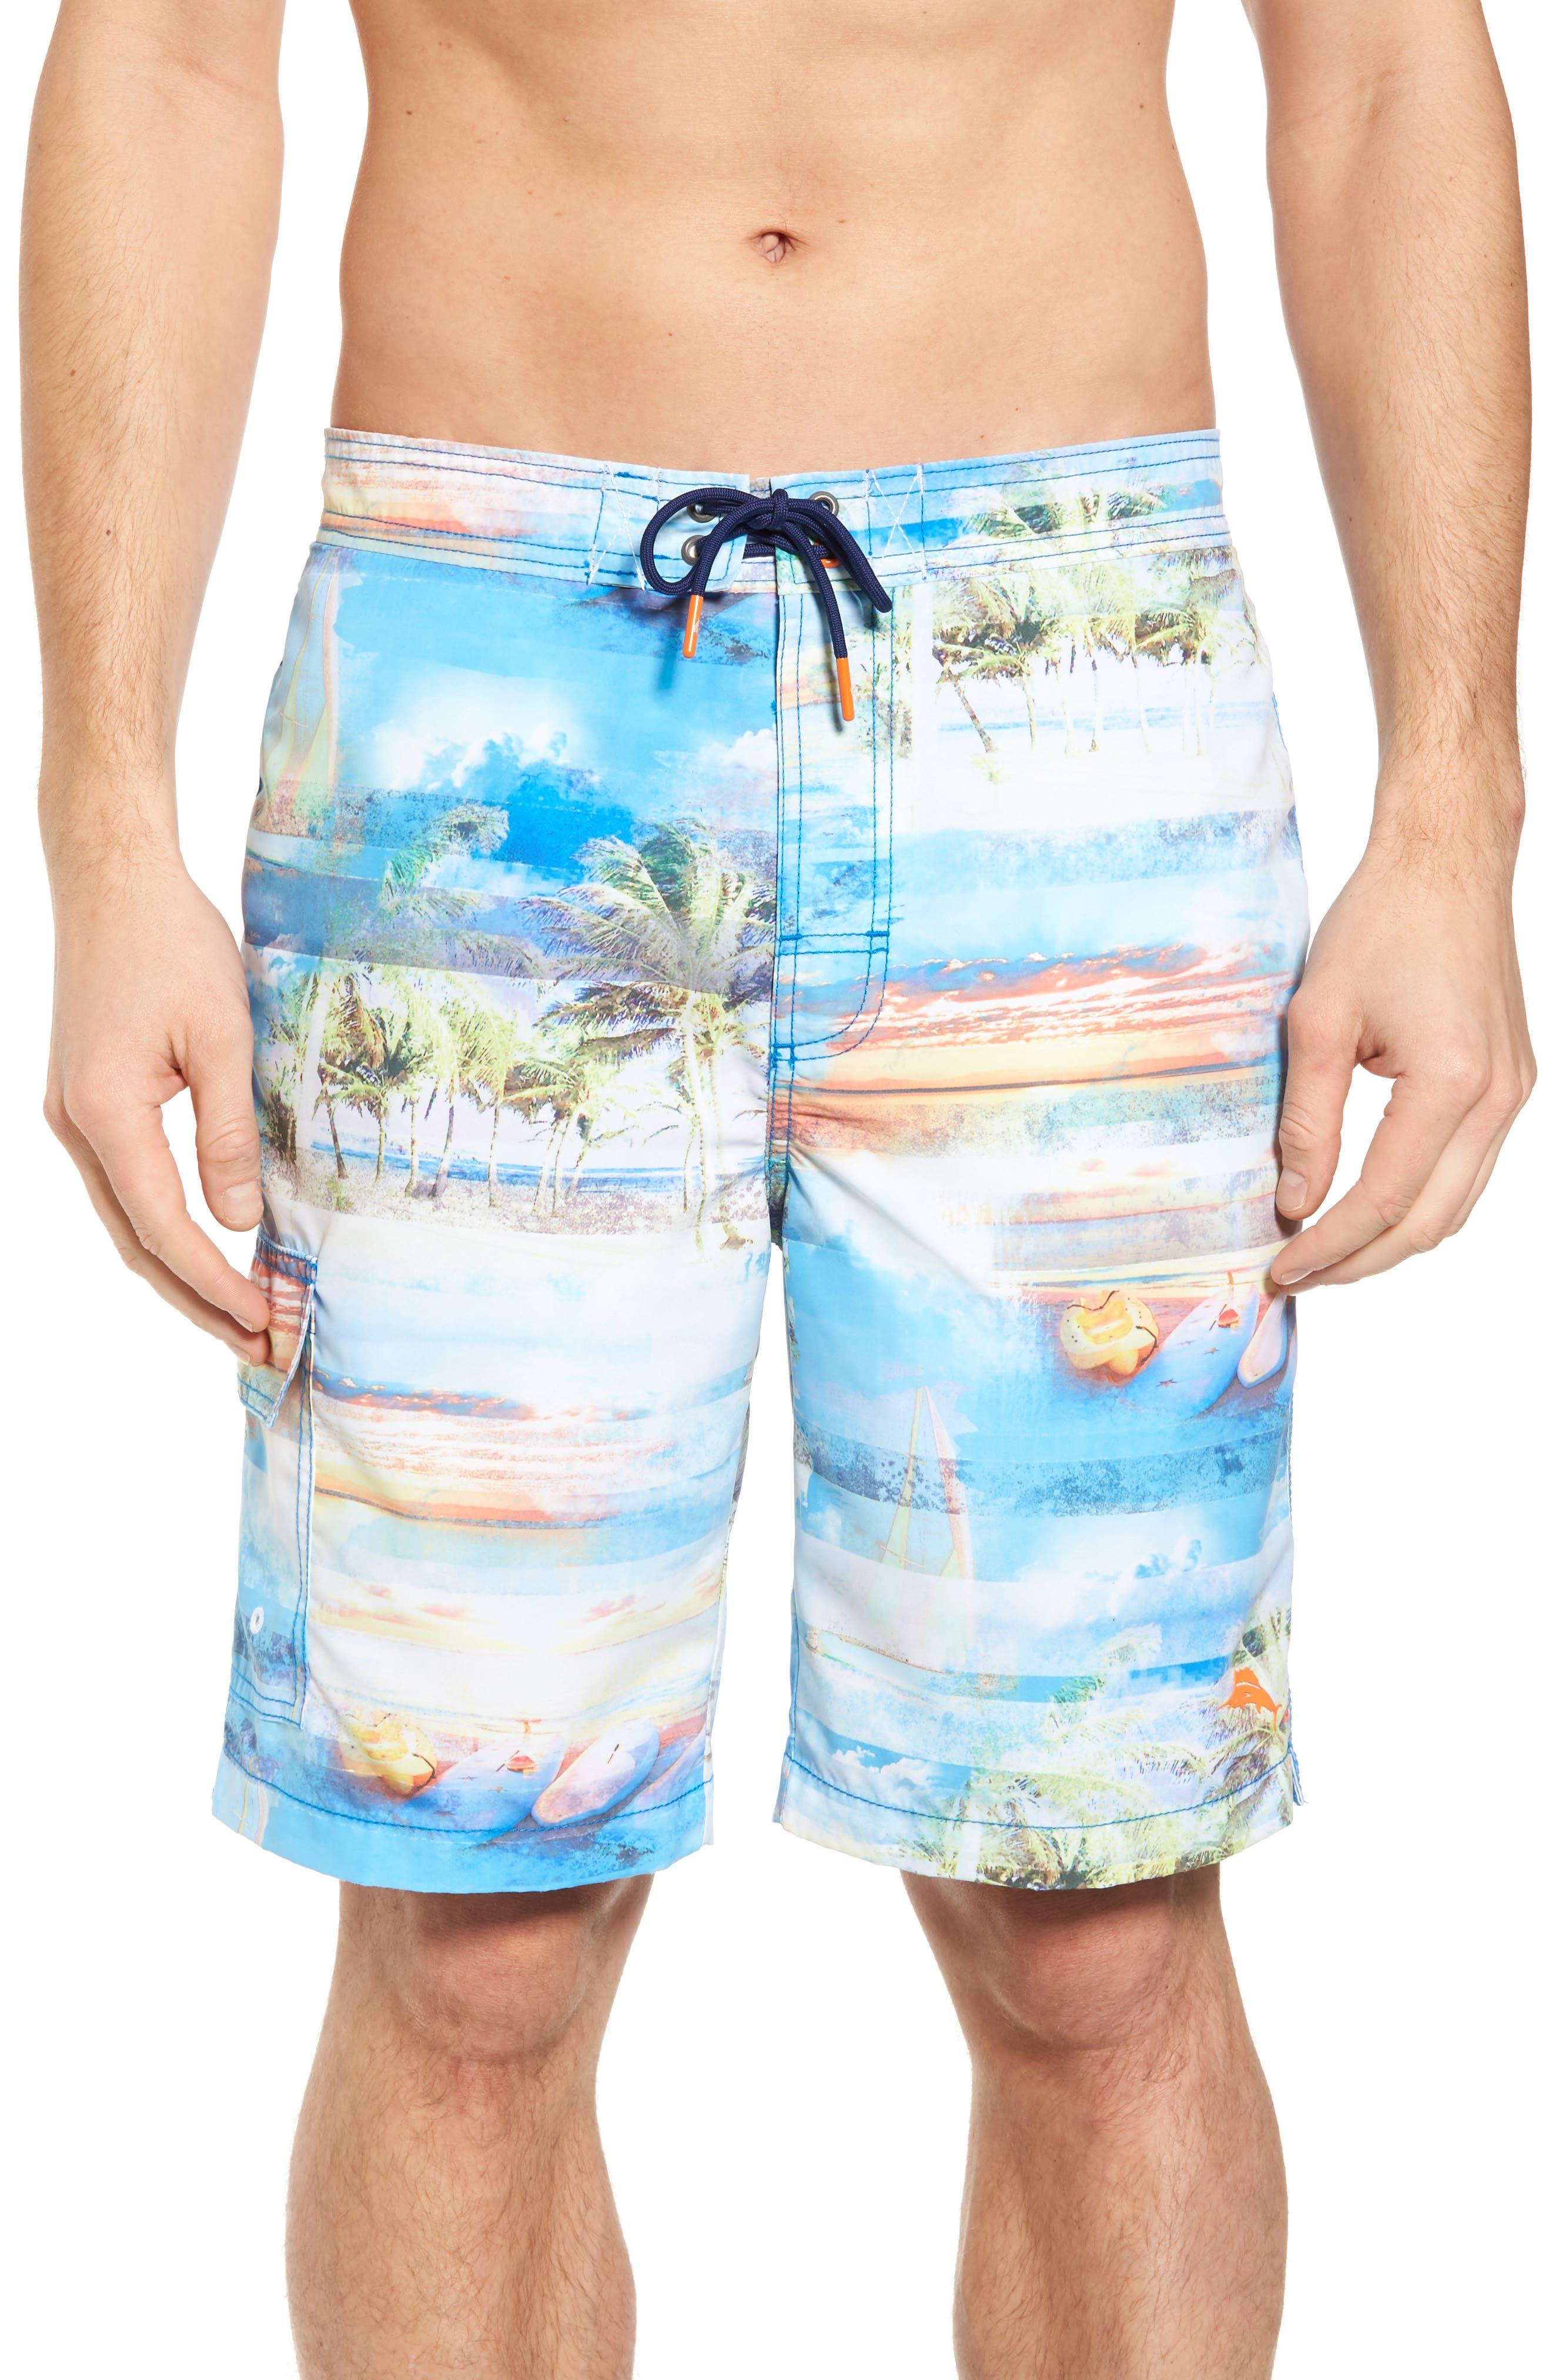 Baja Electric Beach Swim Trunks,                             Main thumbnail 1, color,                             Galaxy Blue